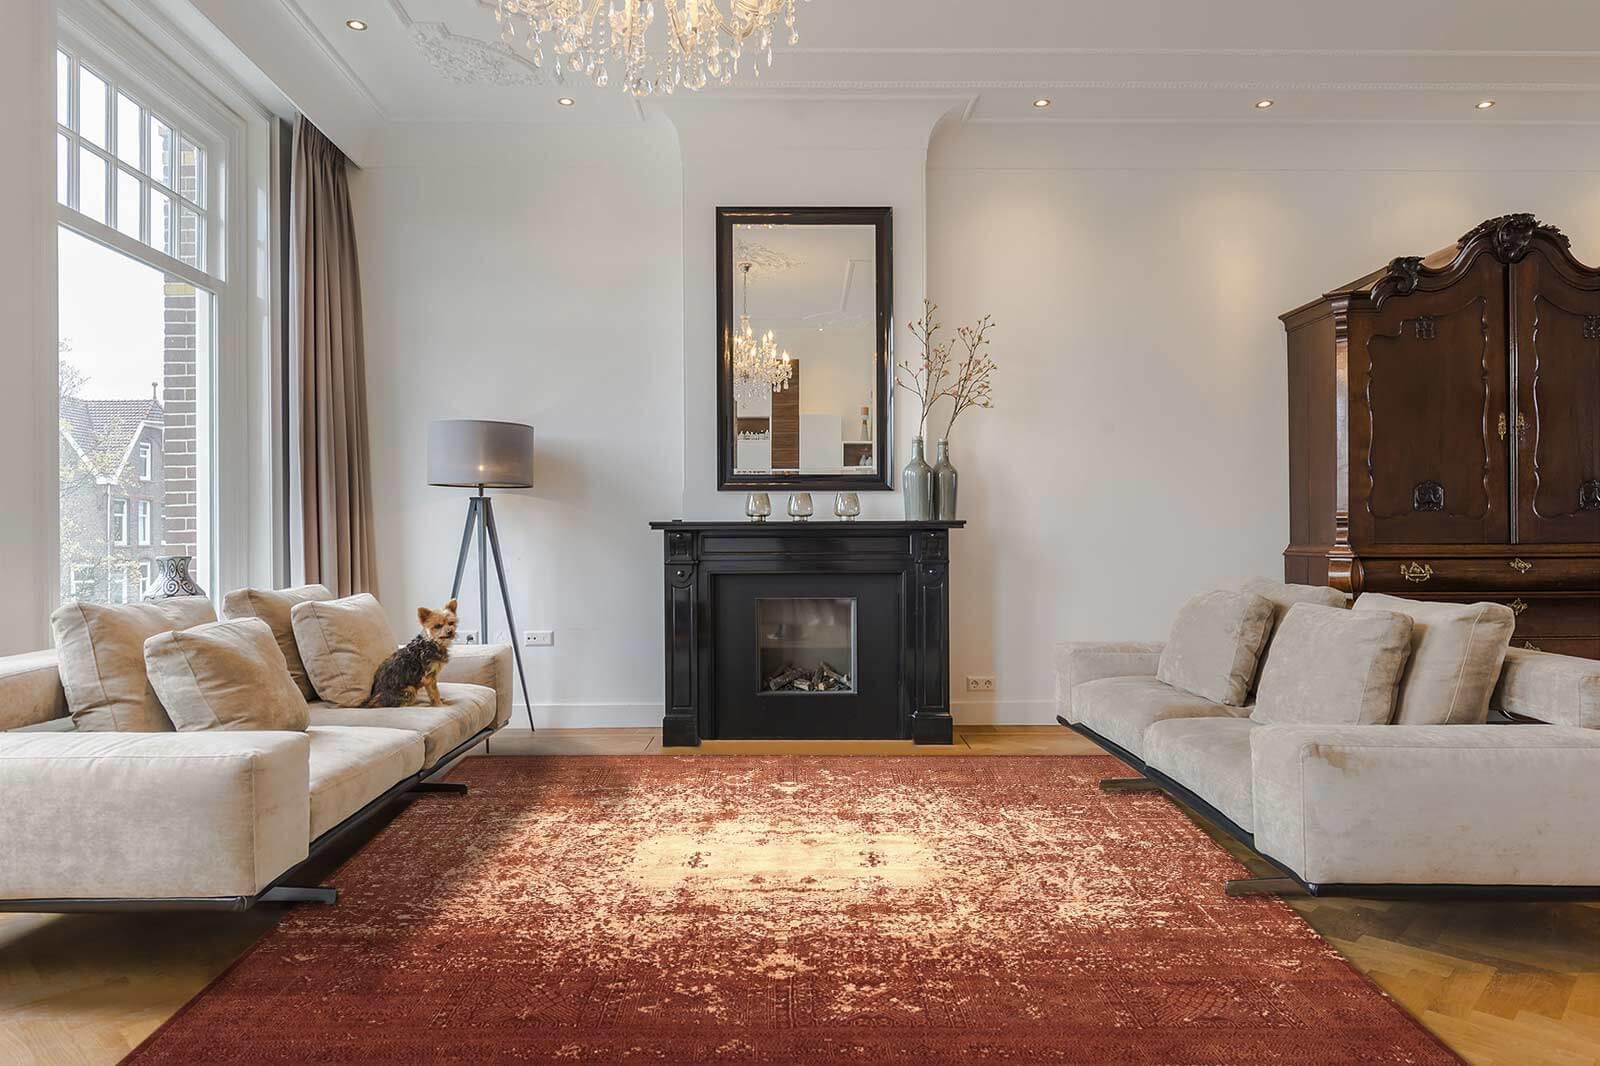 lavish-design-tapijt-banken